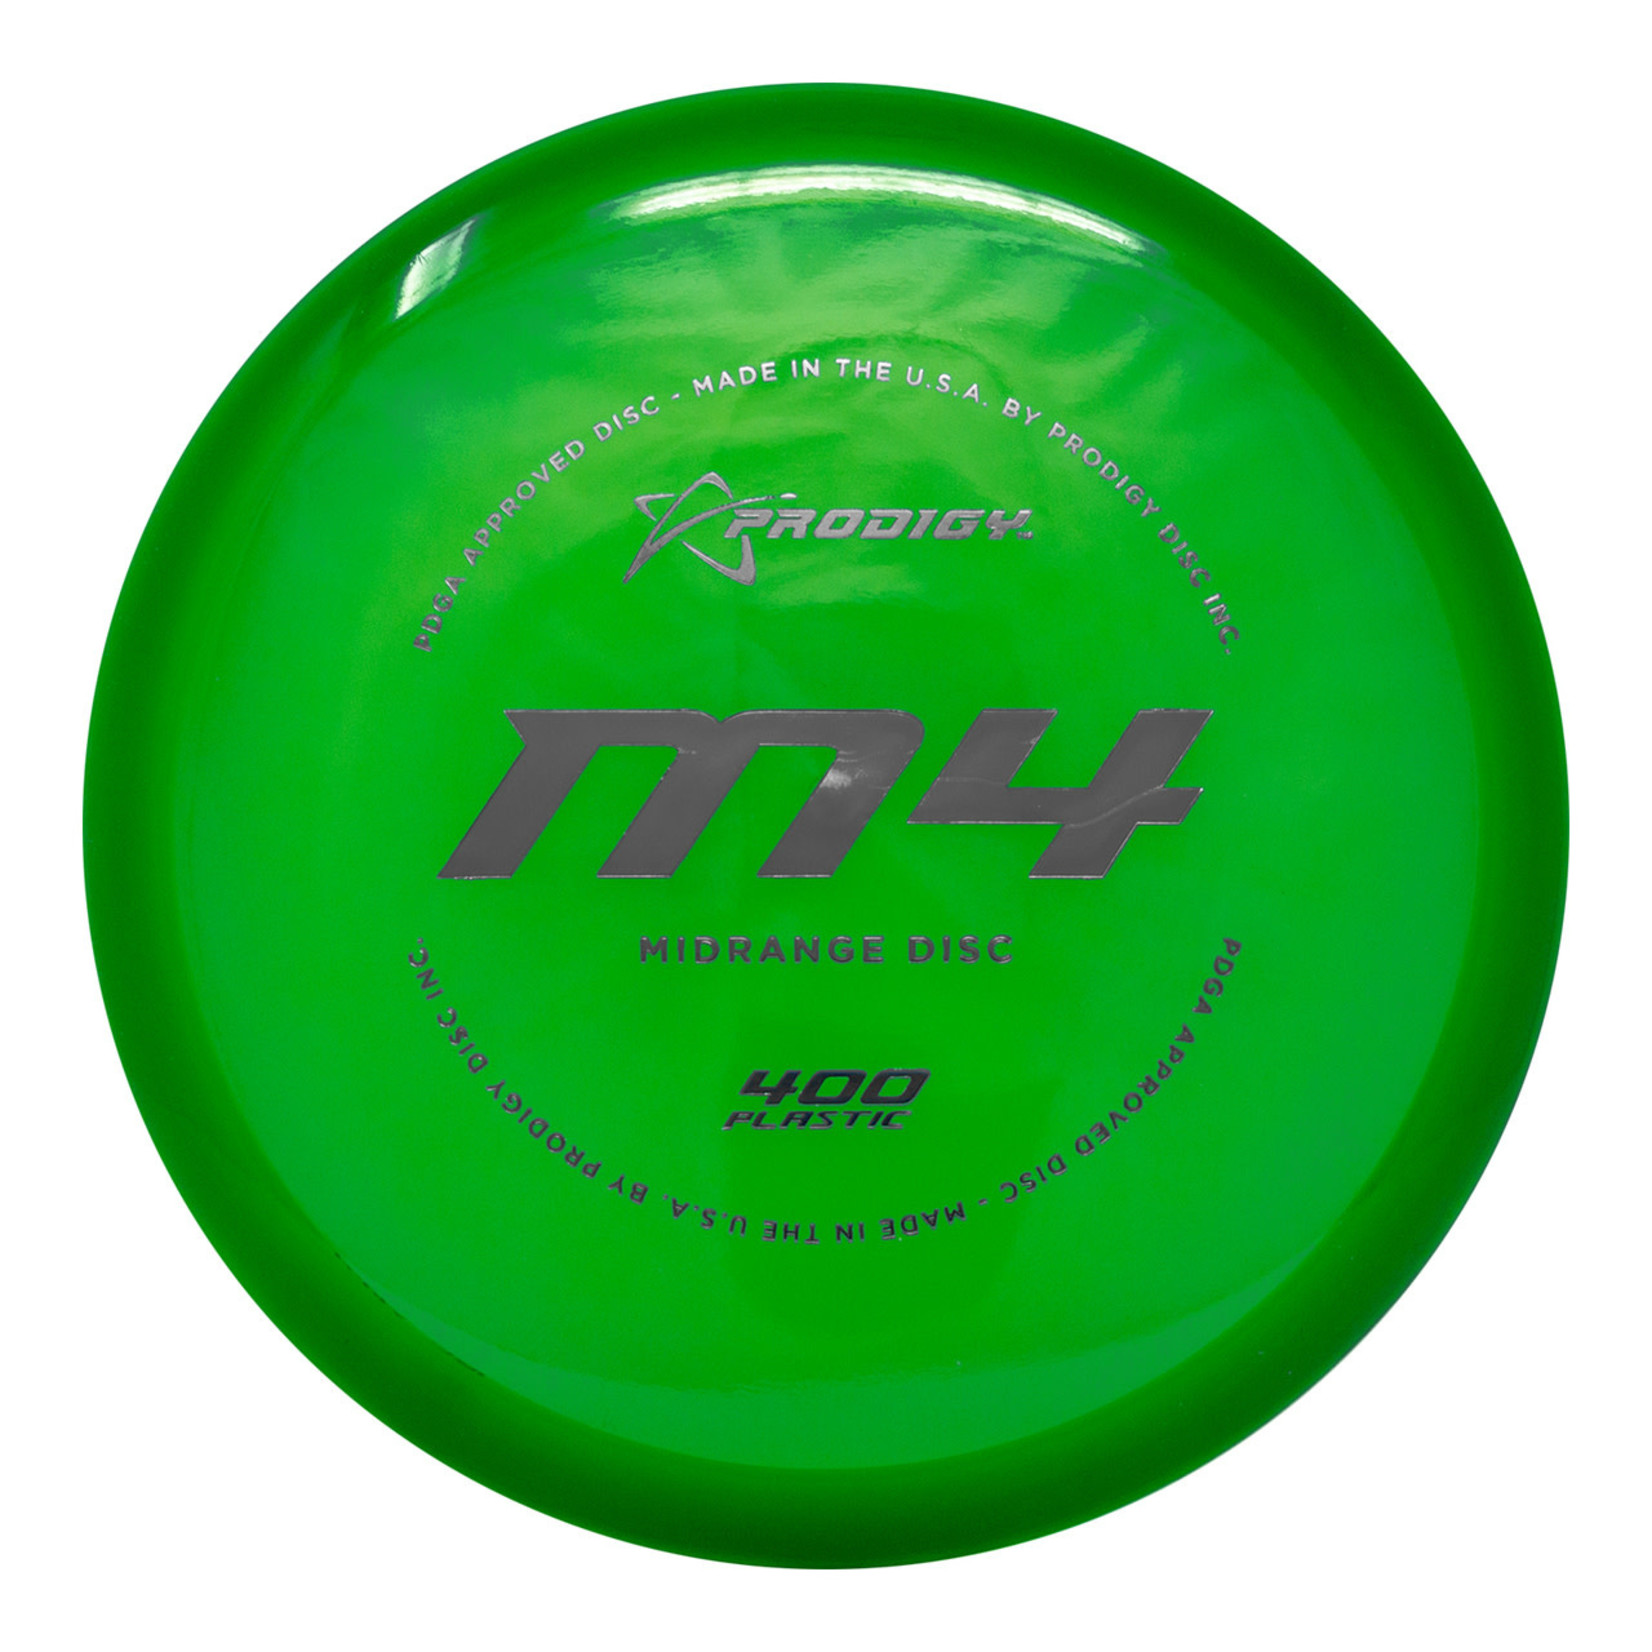 Prodigy Prodigy Disc, M4 Midrange Driver, M4-4-180